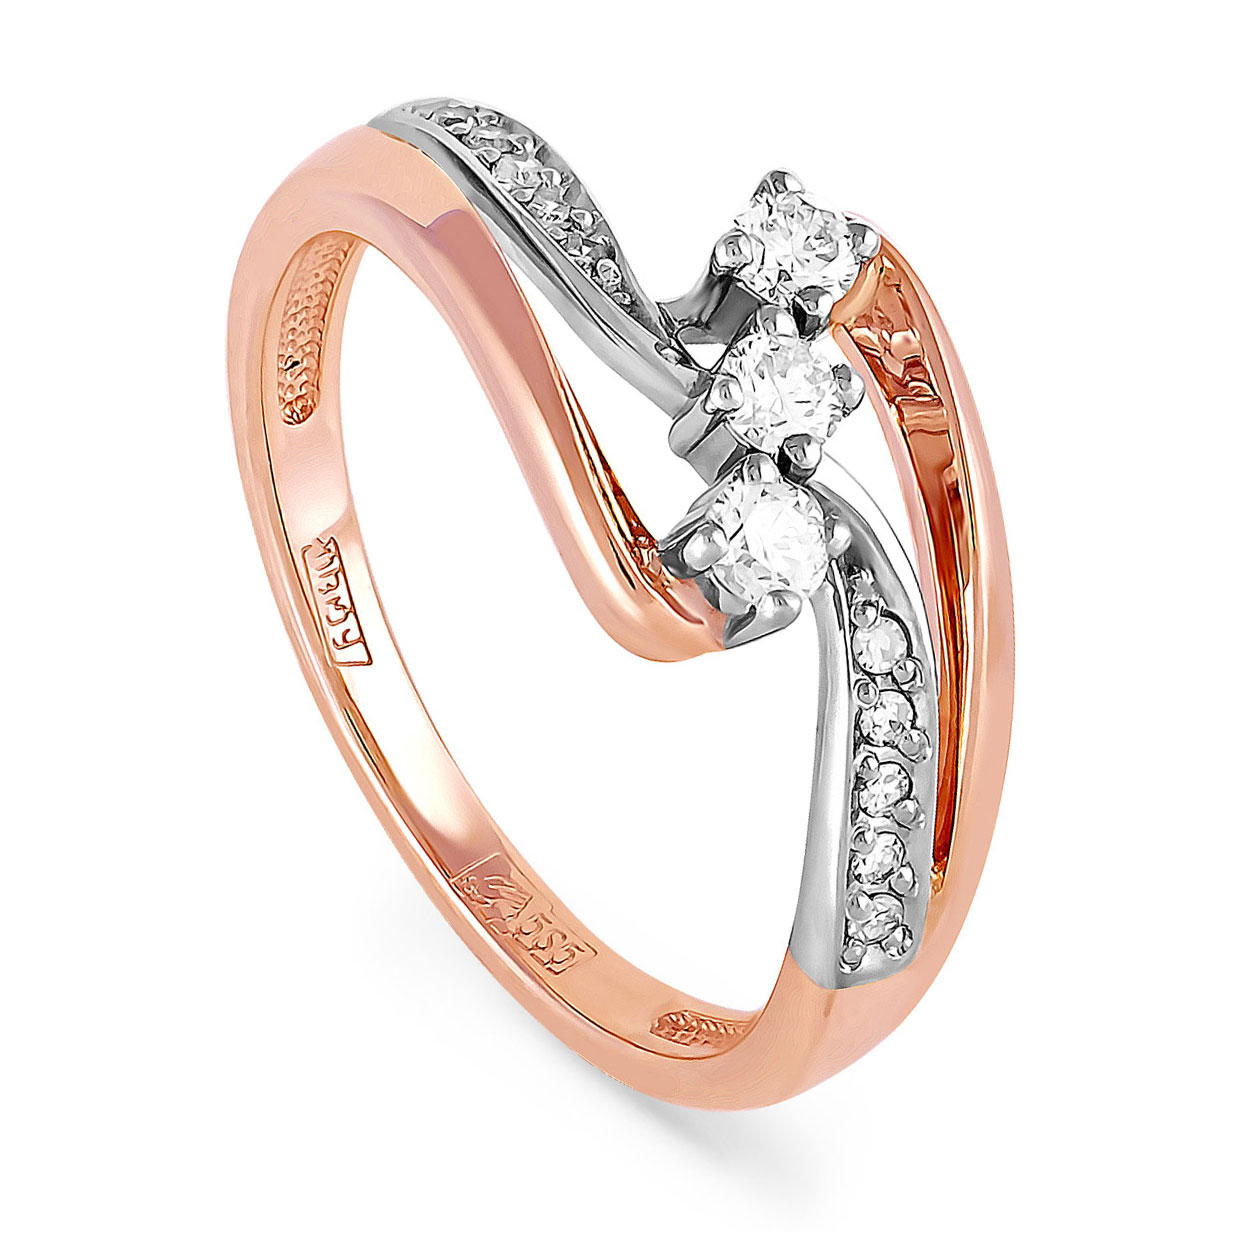 Золотое кольцо Бриллиант арт. 1-0152-1000 1-0152-1000